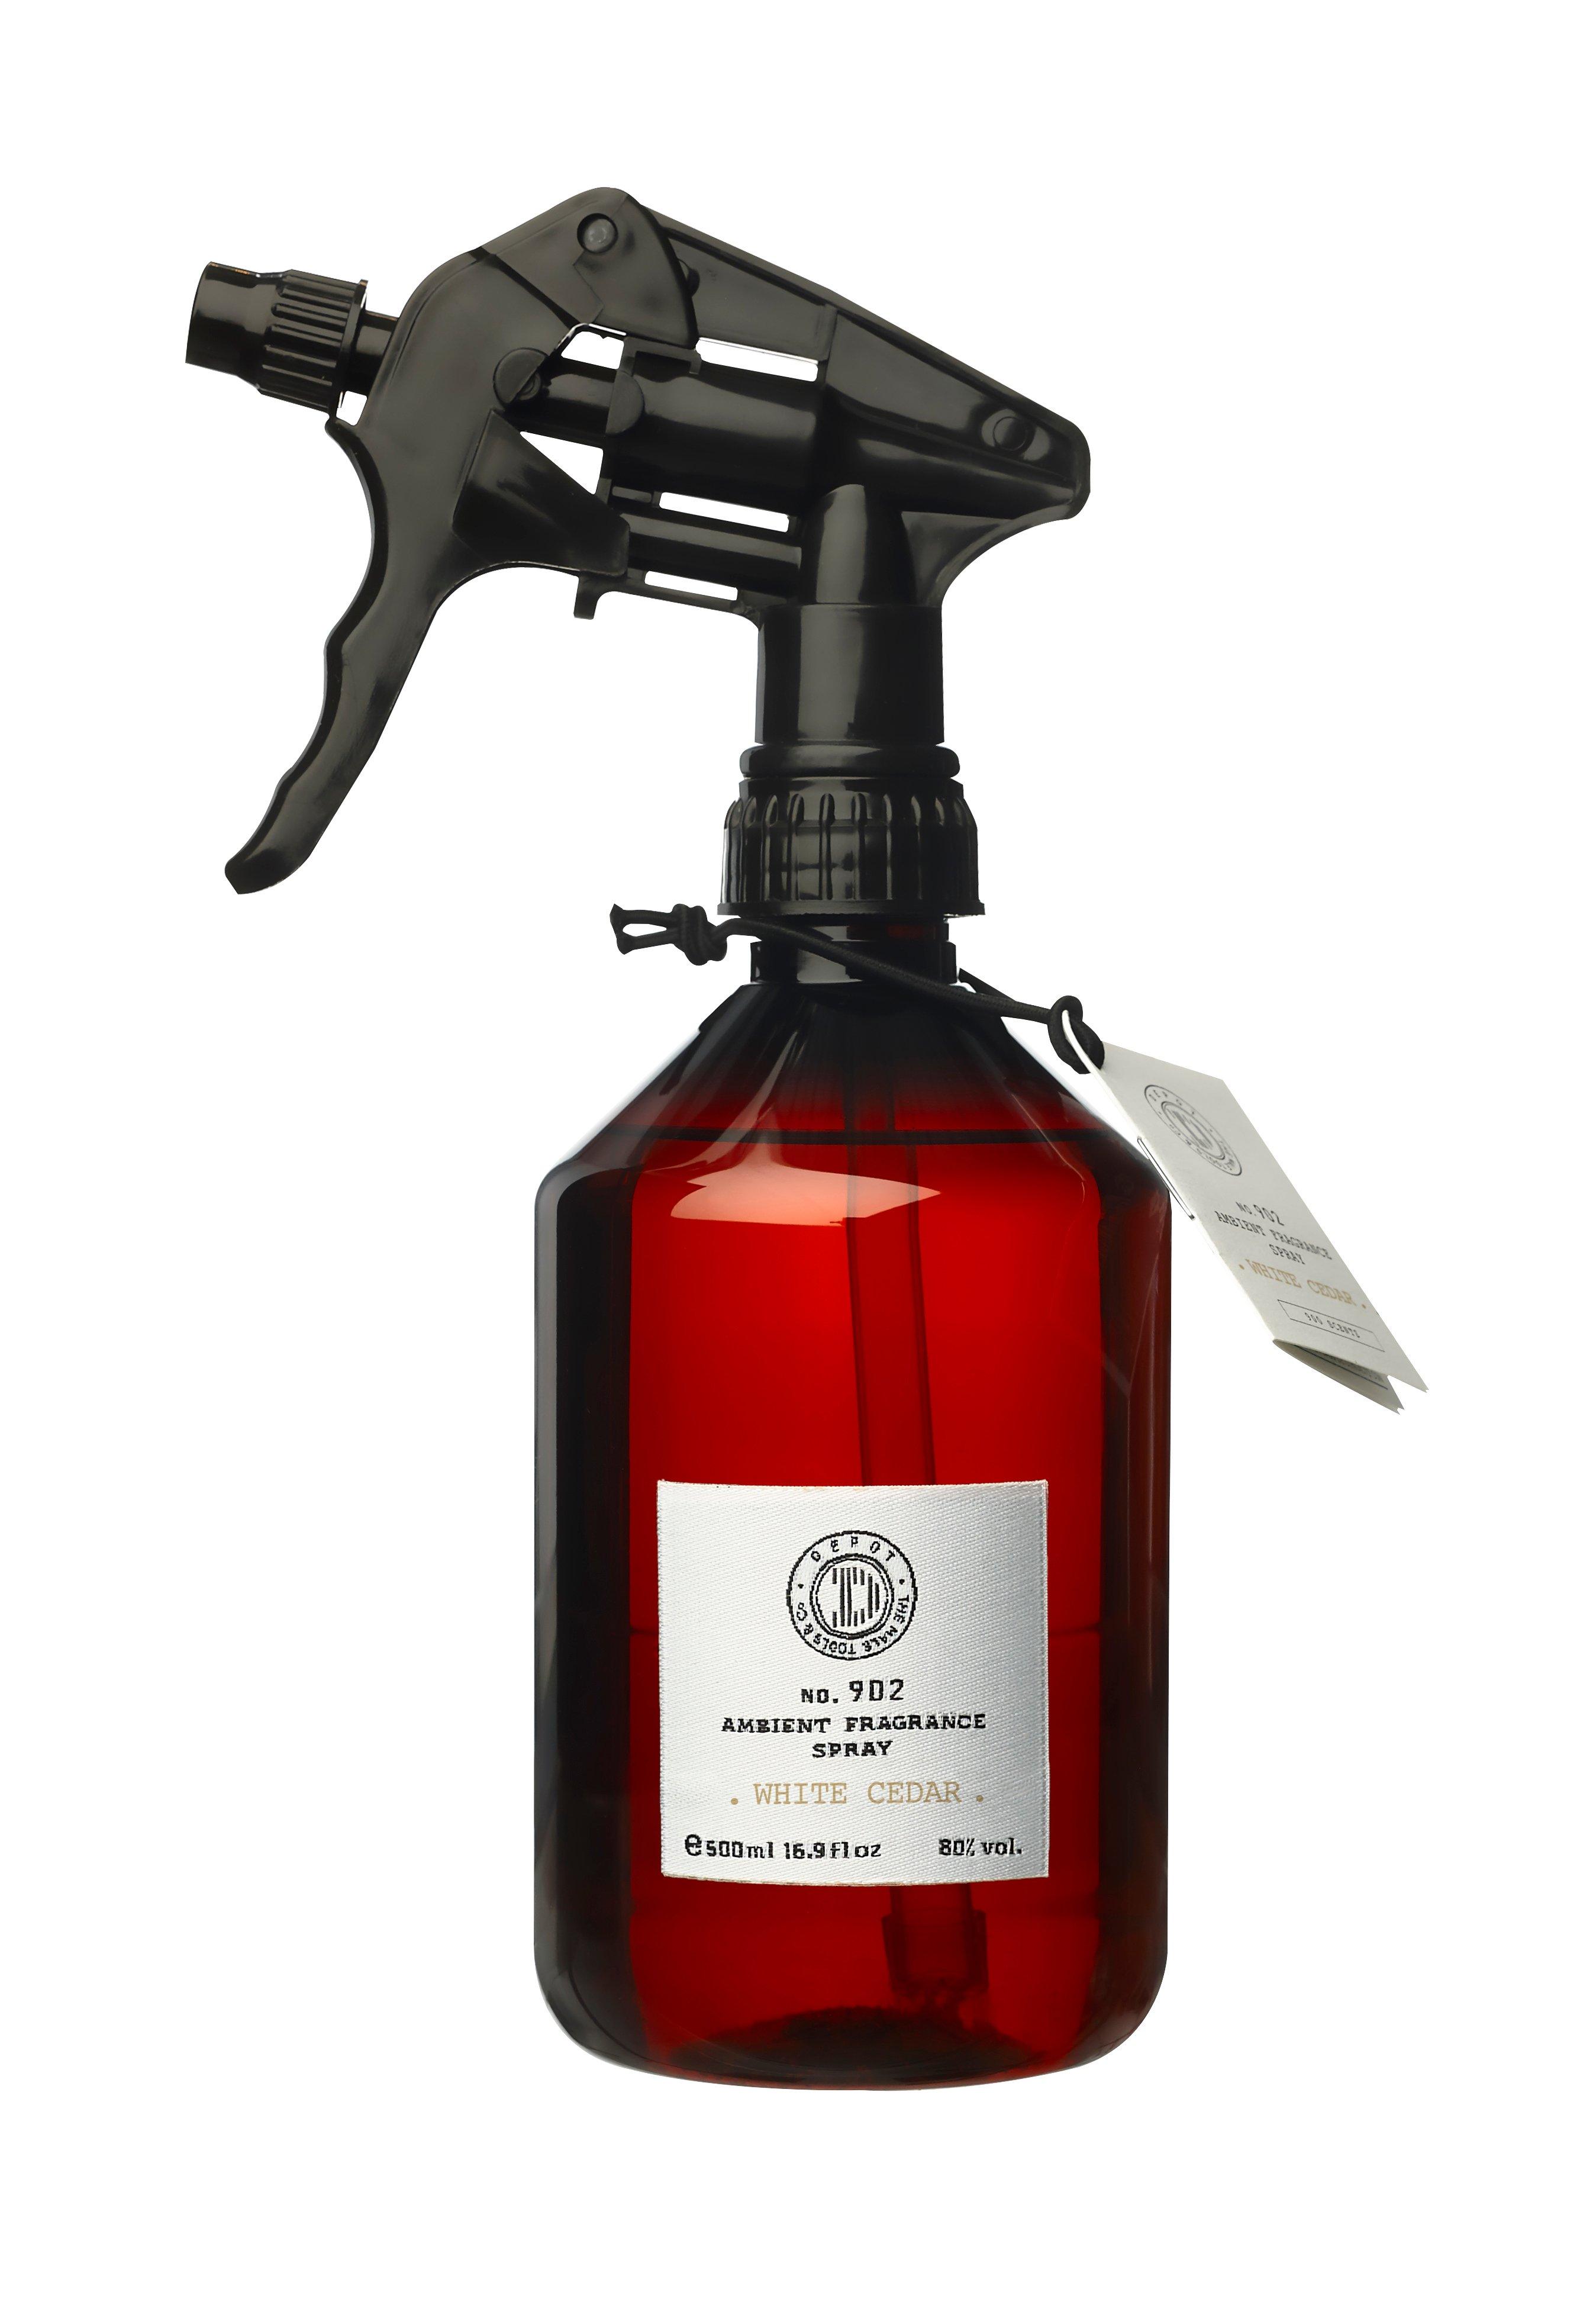 Depot - No. 902 Ambient Fragrance Spray - White Cedar